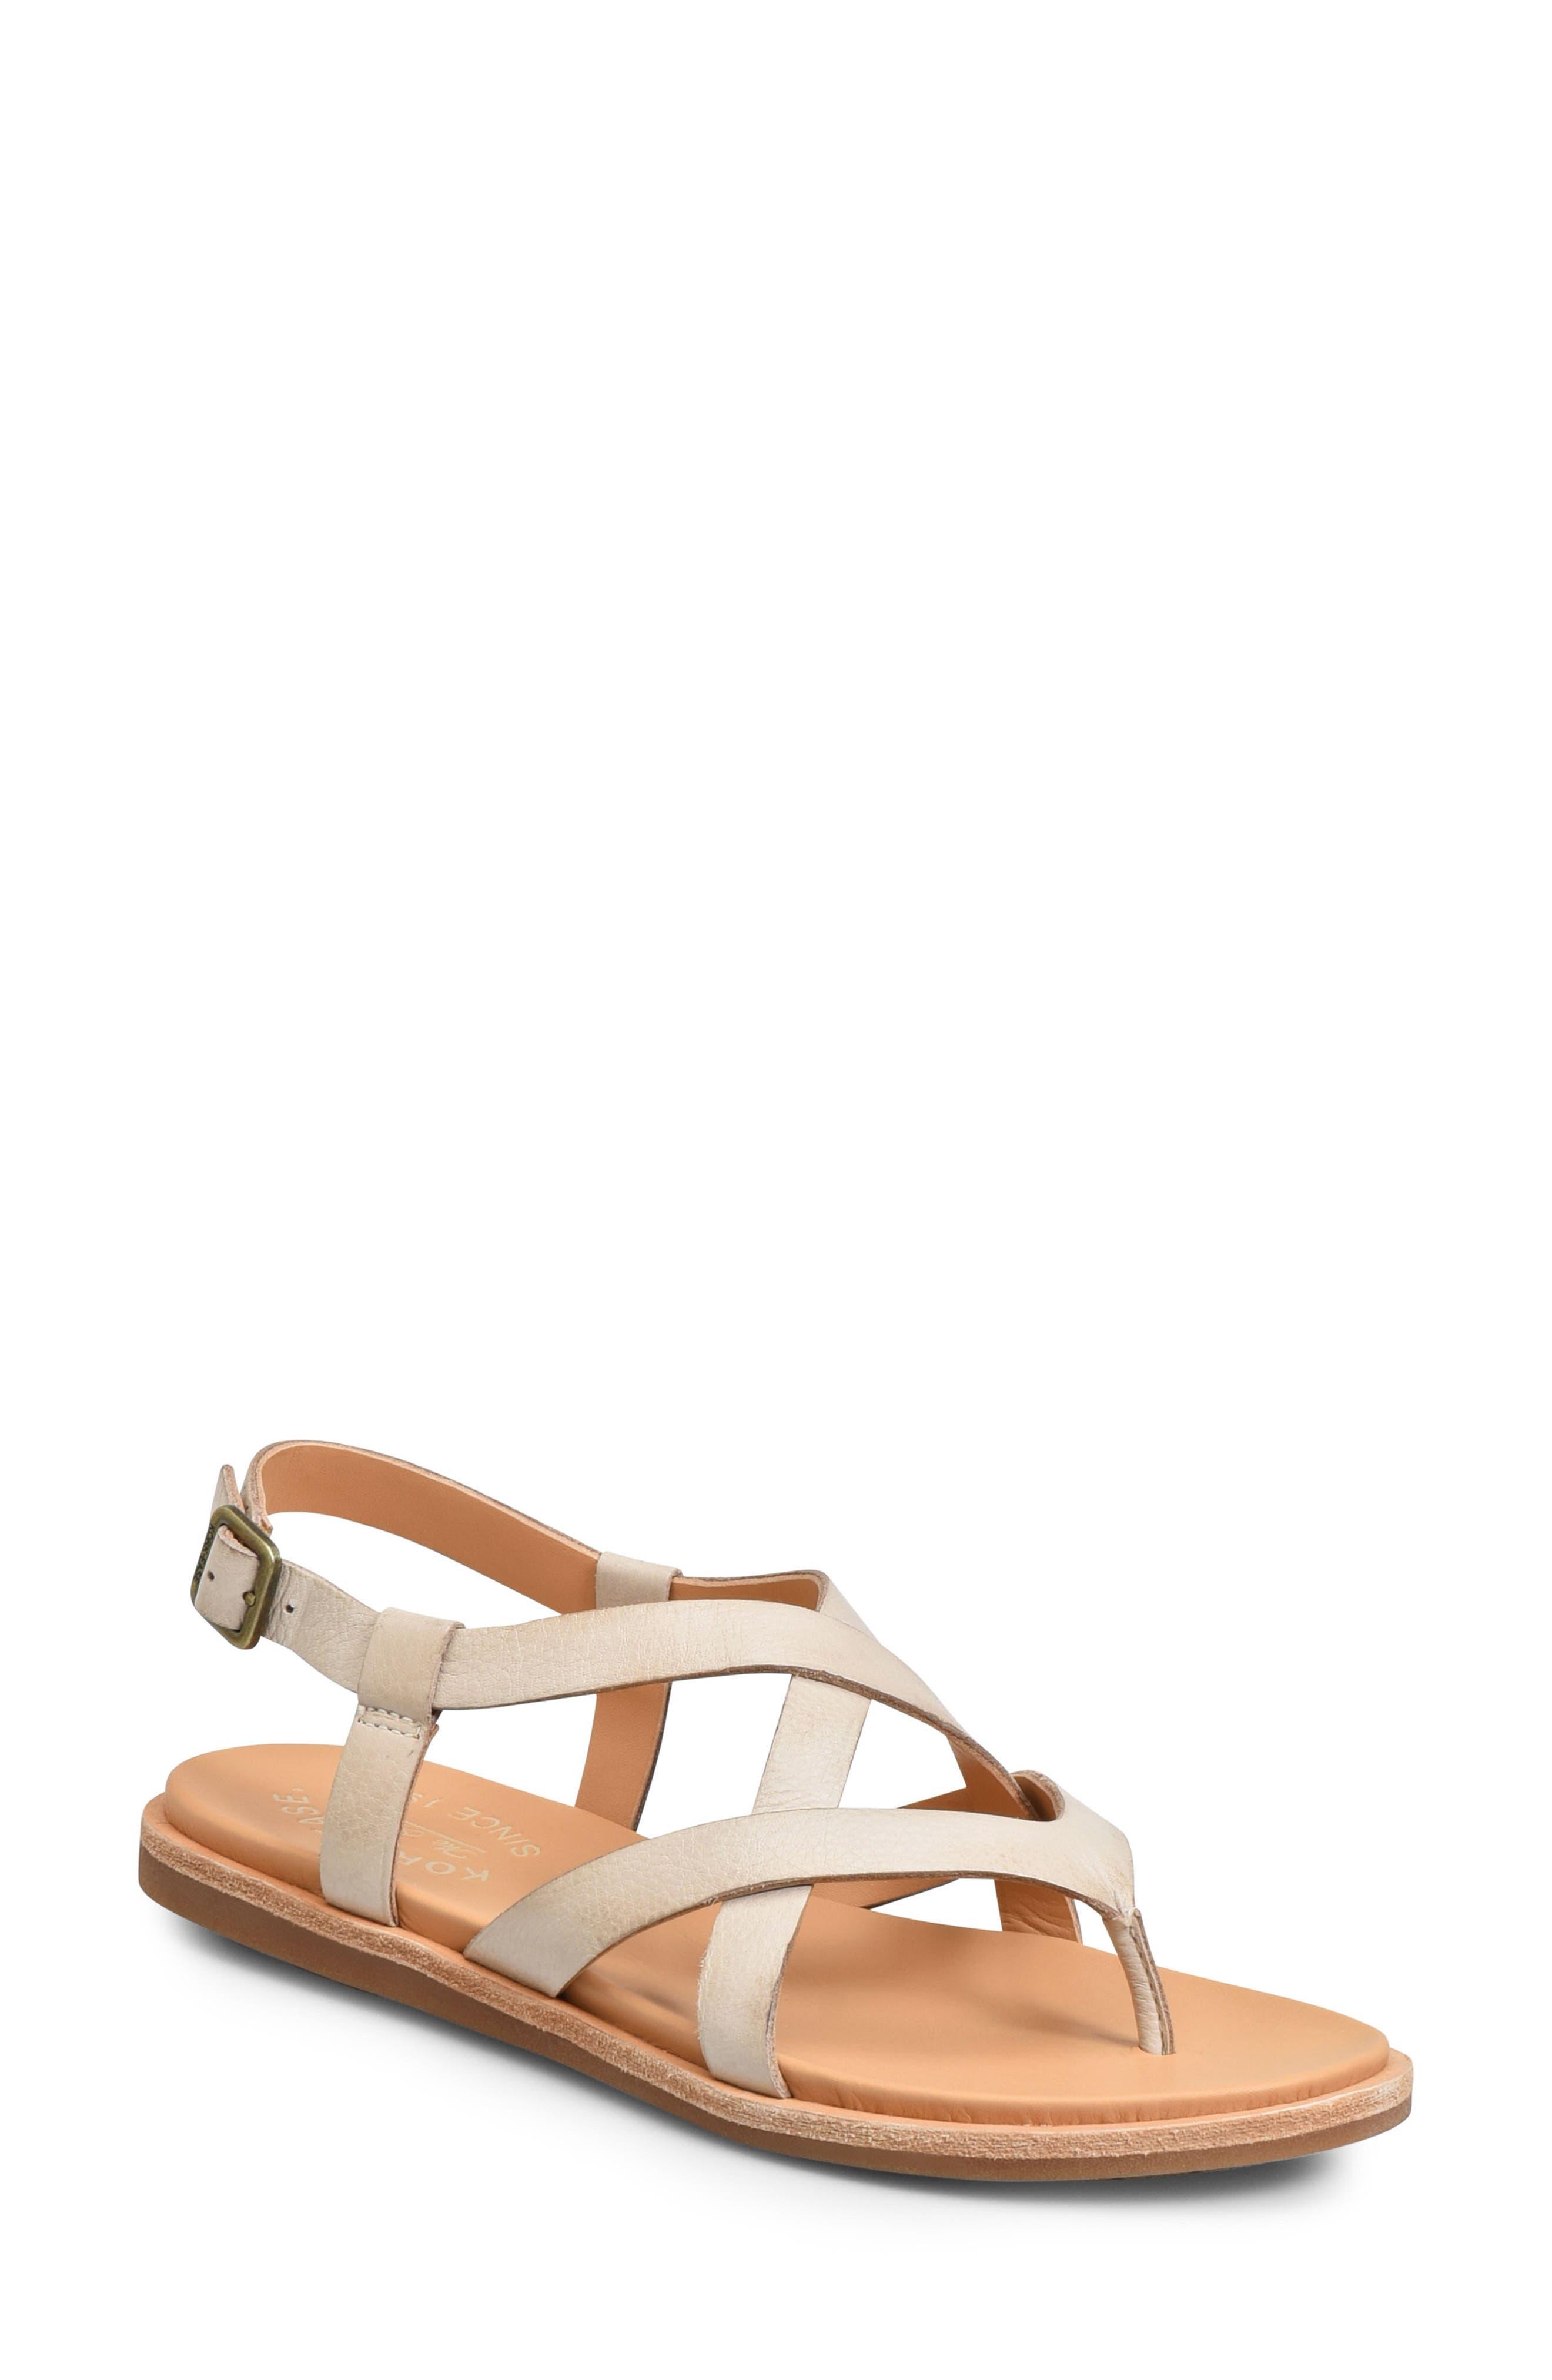 Yarbrough Sandal,                         Main,                         color, LIGHT GREY LEATHER